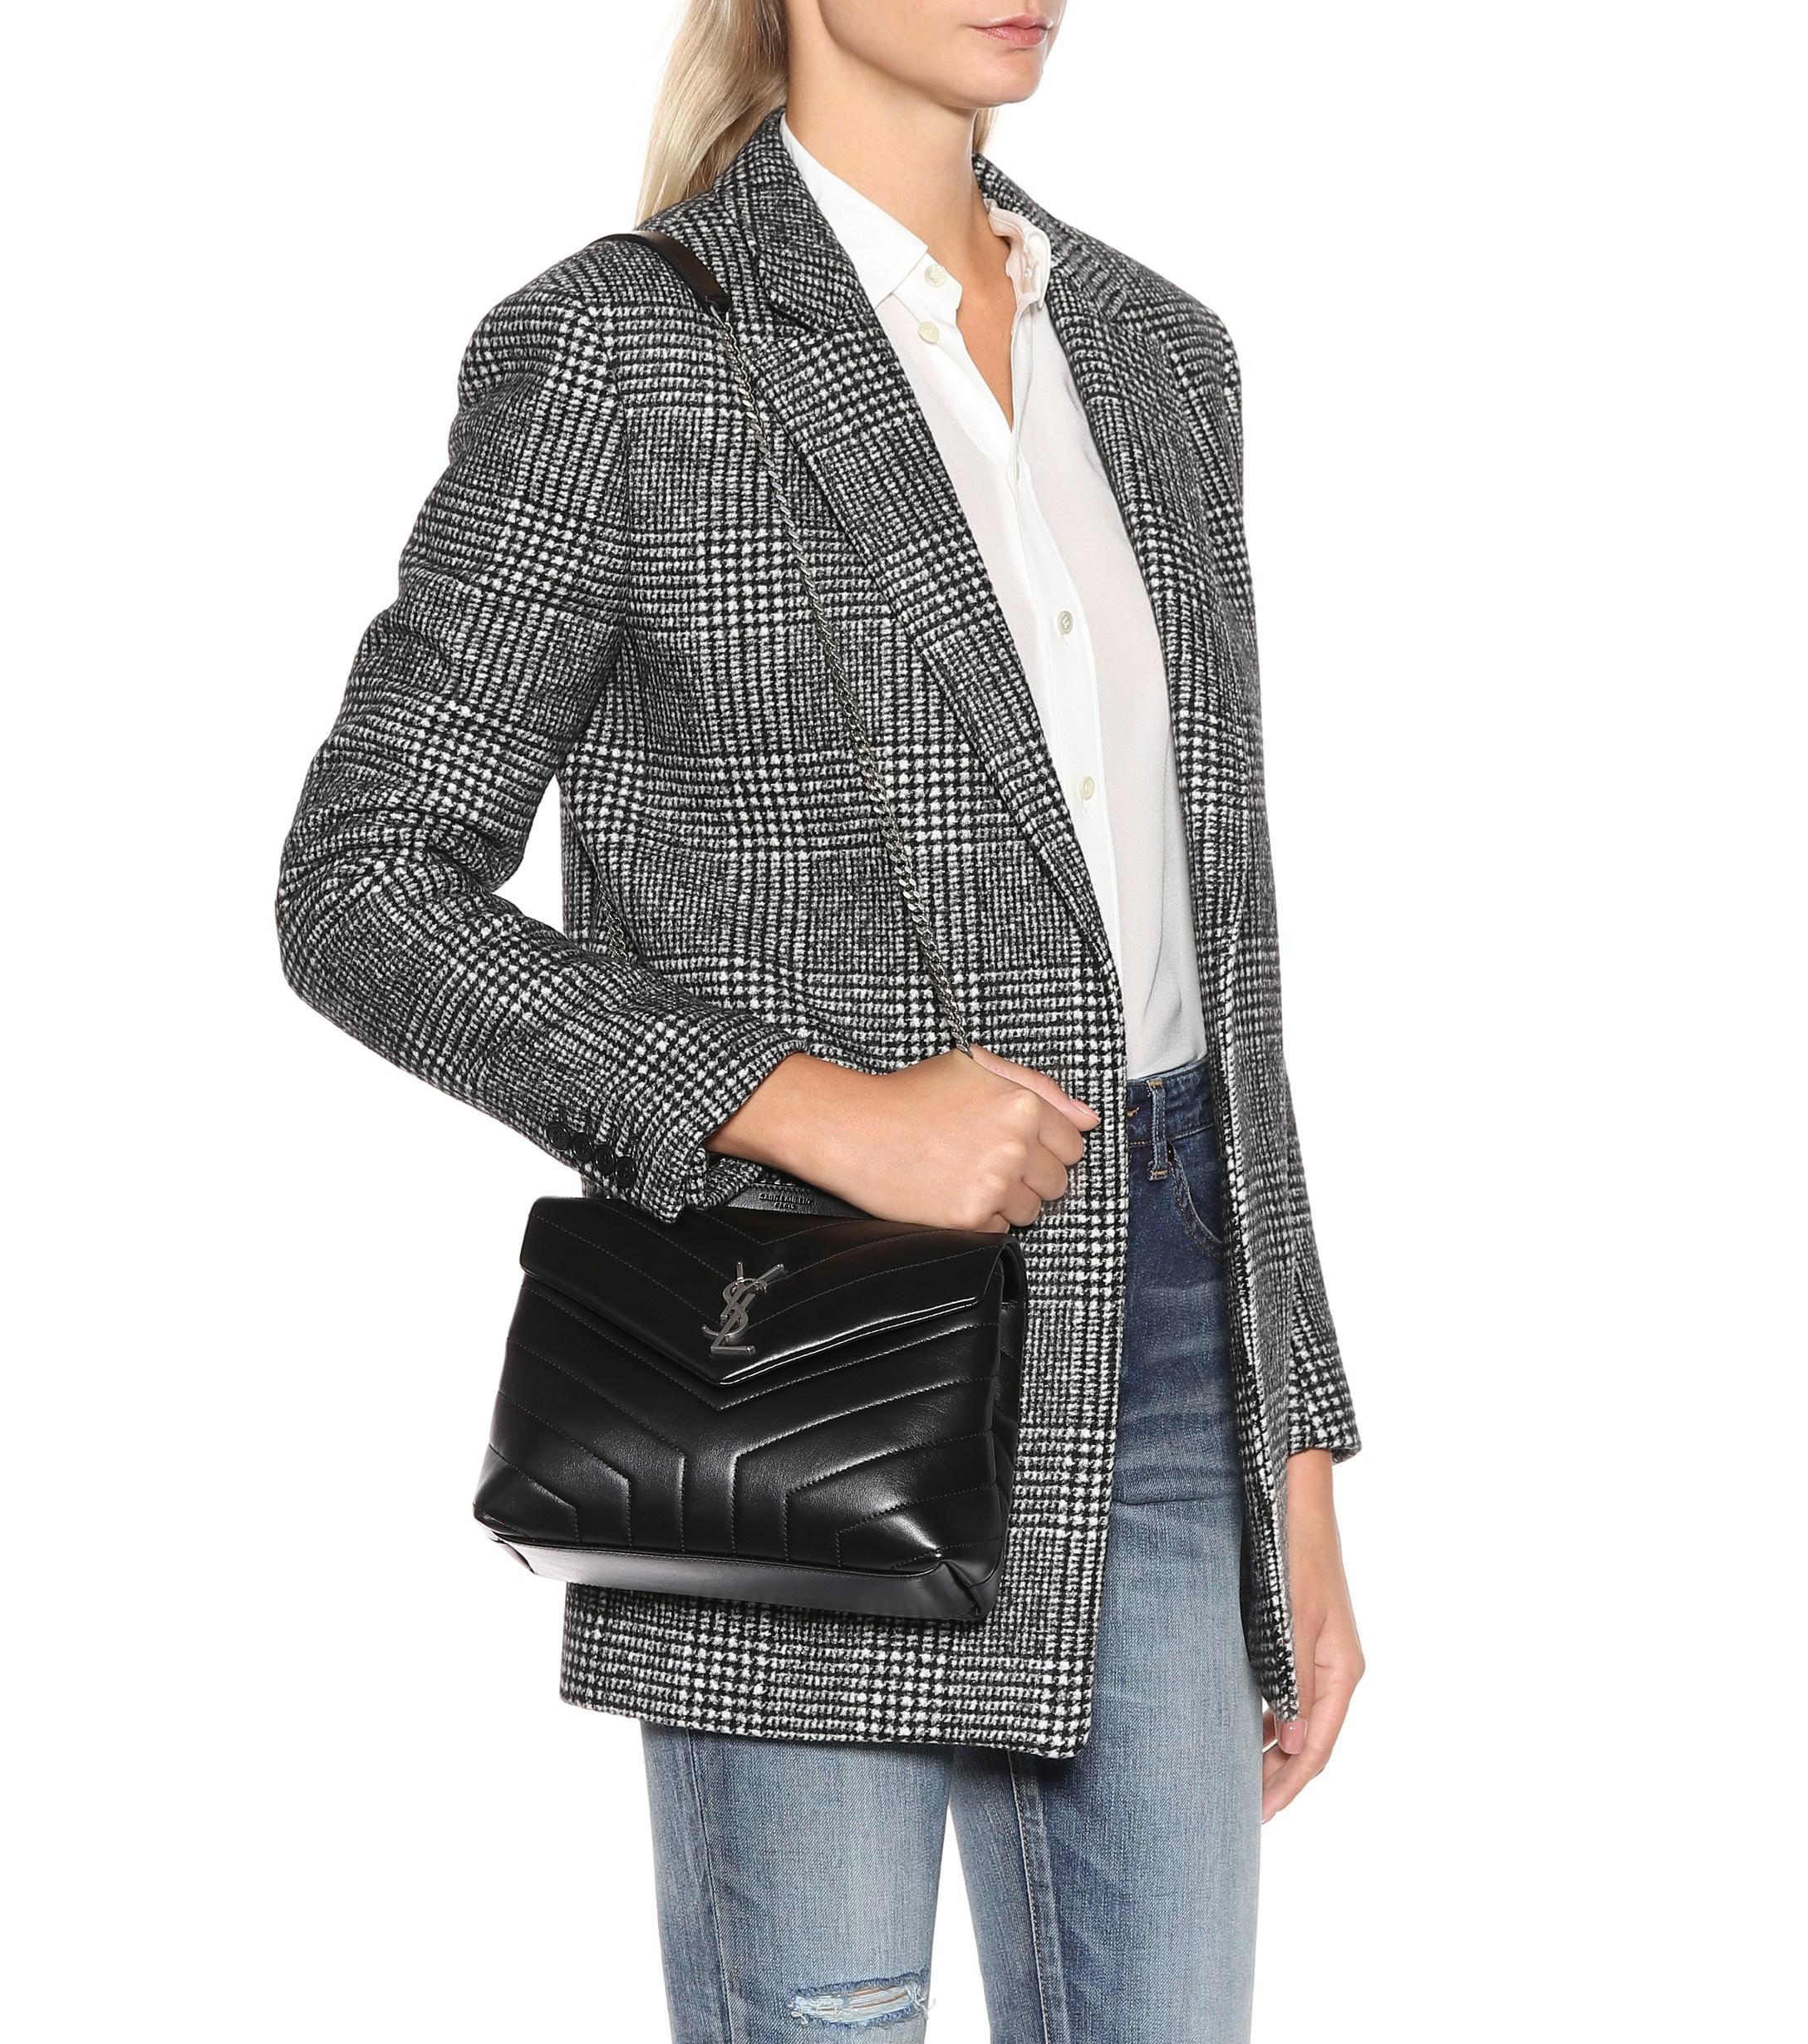 2346d22c3 Saint Laurent Loulou Monogram Small Shoulder Bag in Black - Lyst